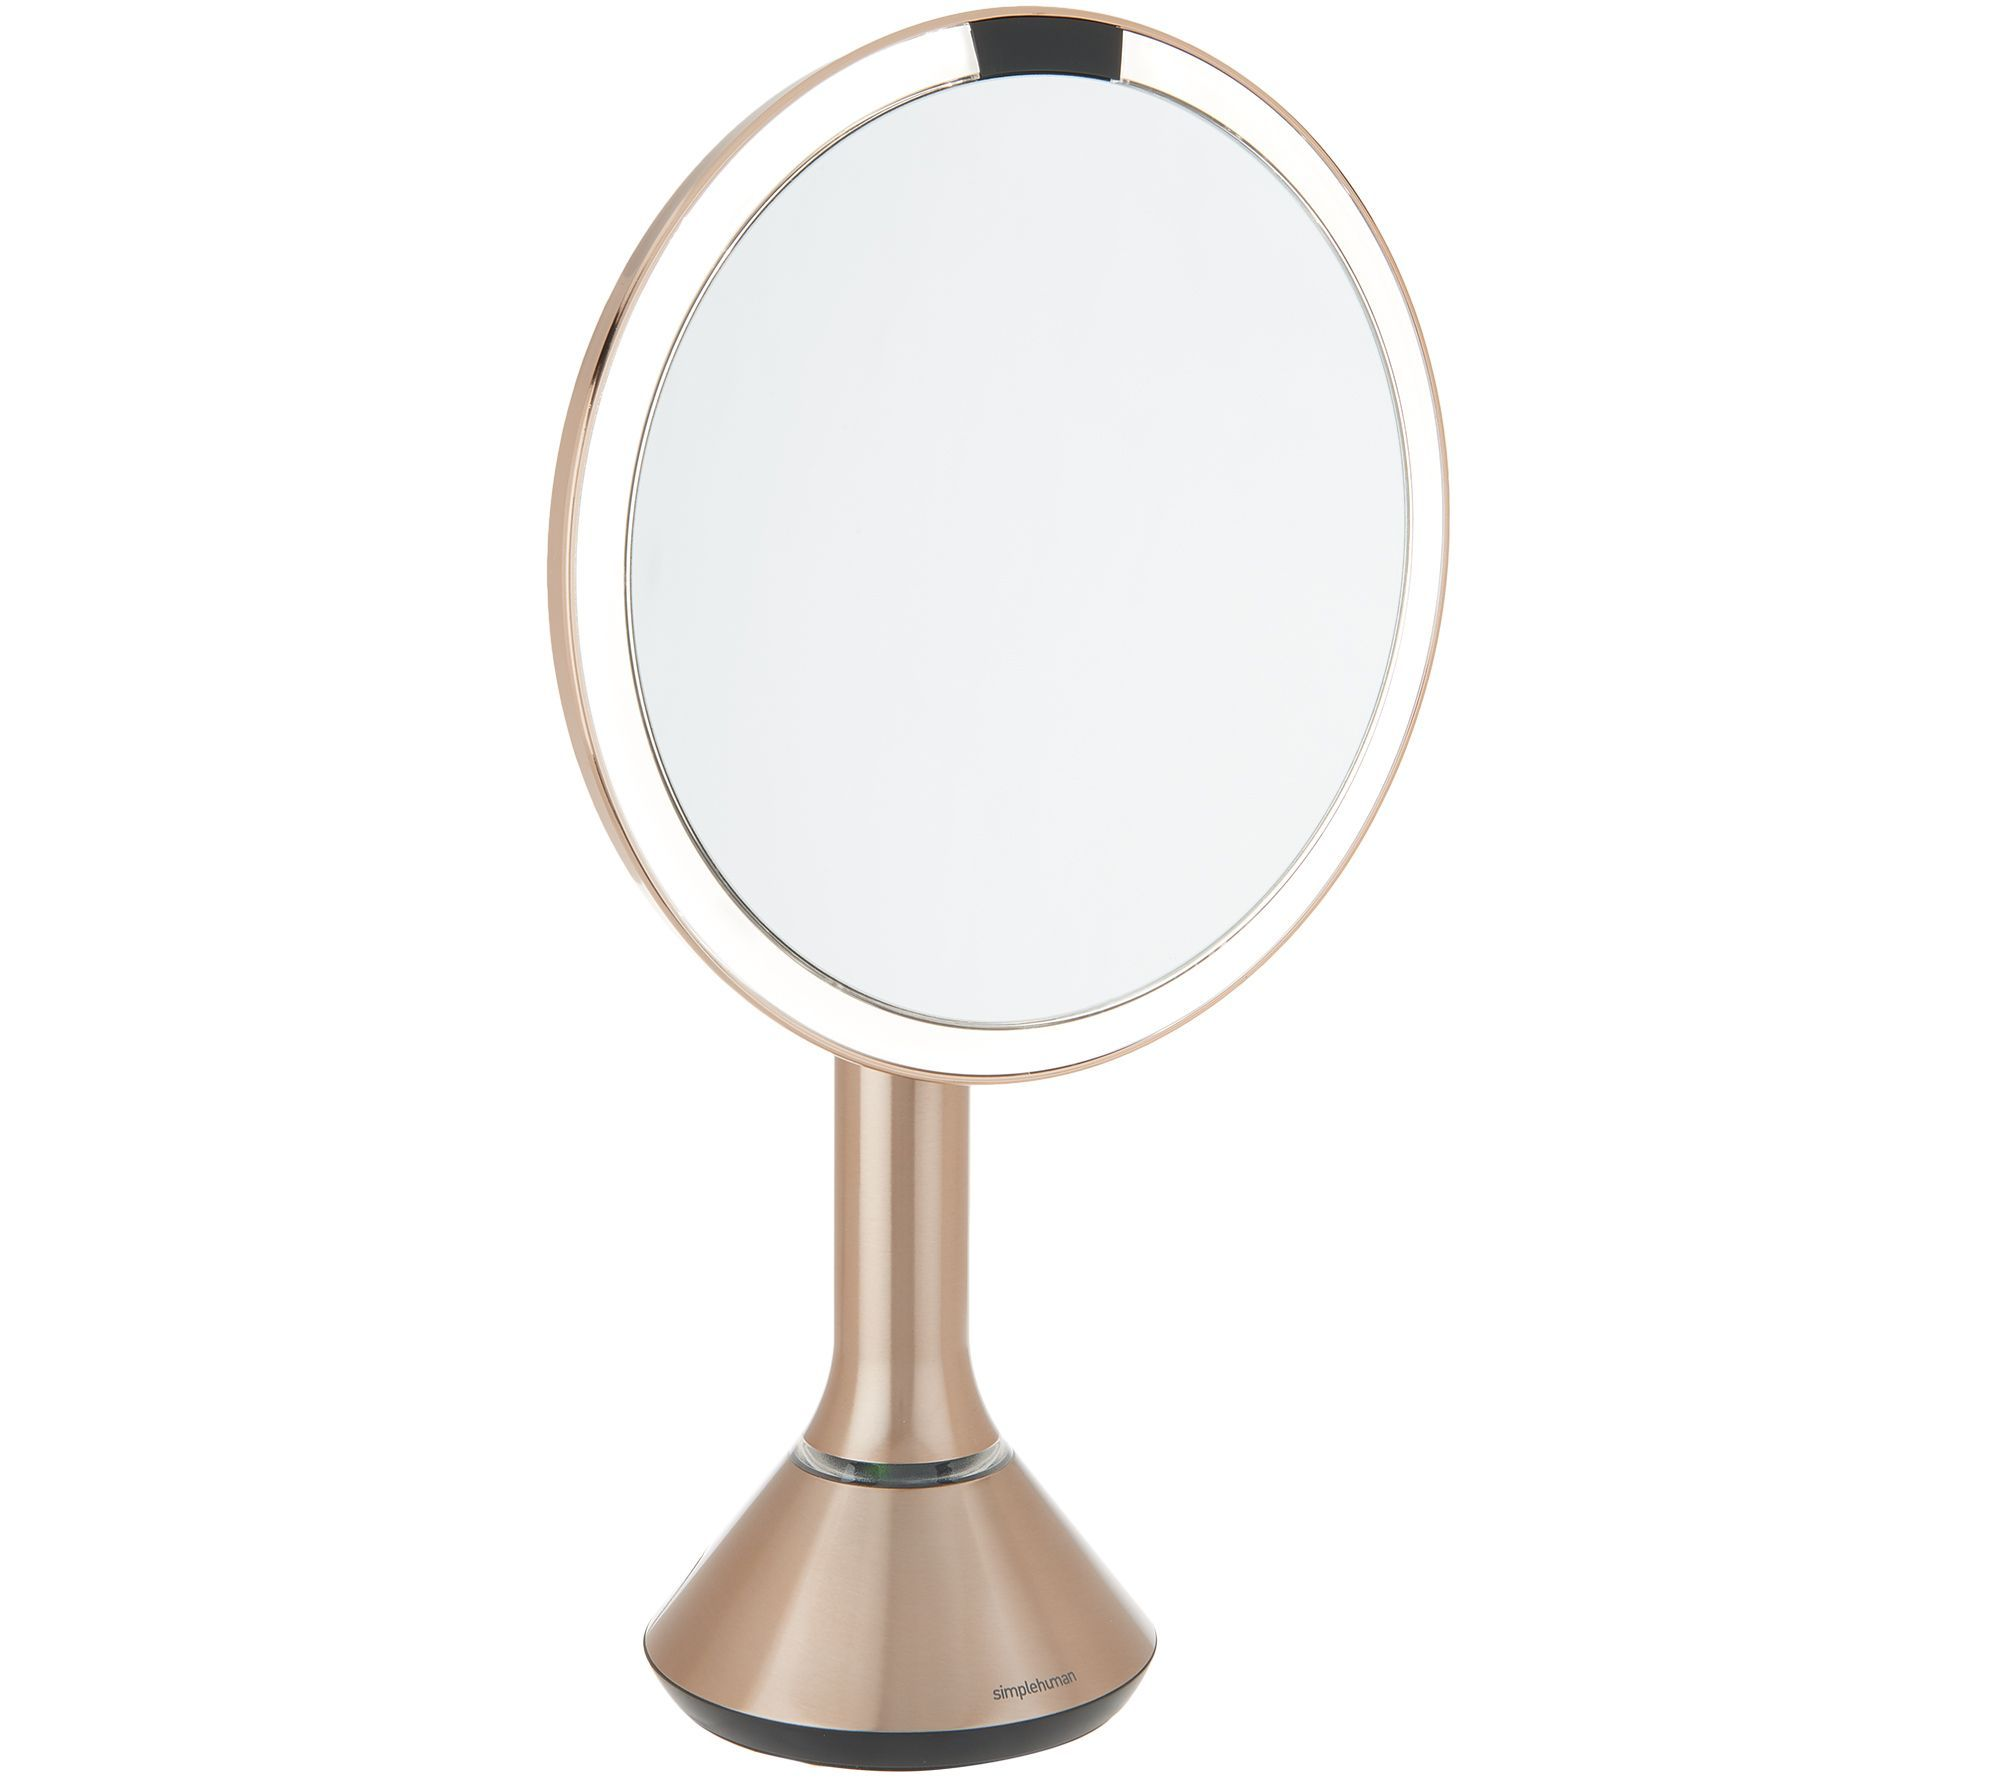 Simplehuman 8 Led Sensor Mirror W 5x Magnification Tru Lux Light Page 1 Qvc Com Magnification Mirror Flawless Makeup Application Magnification